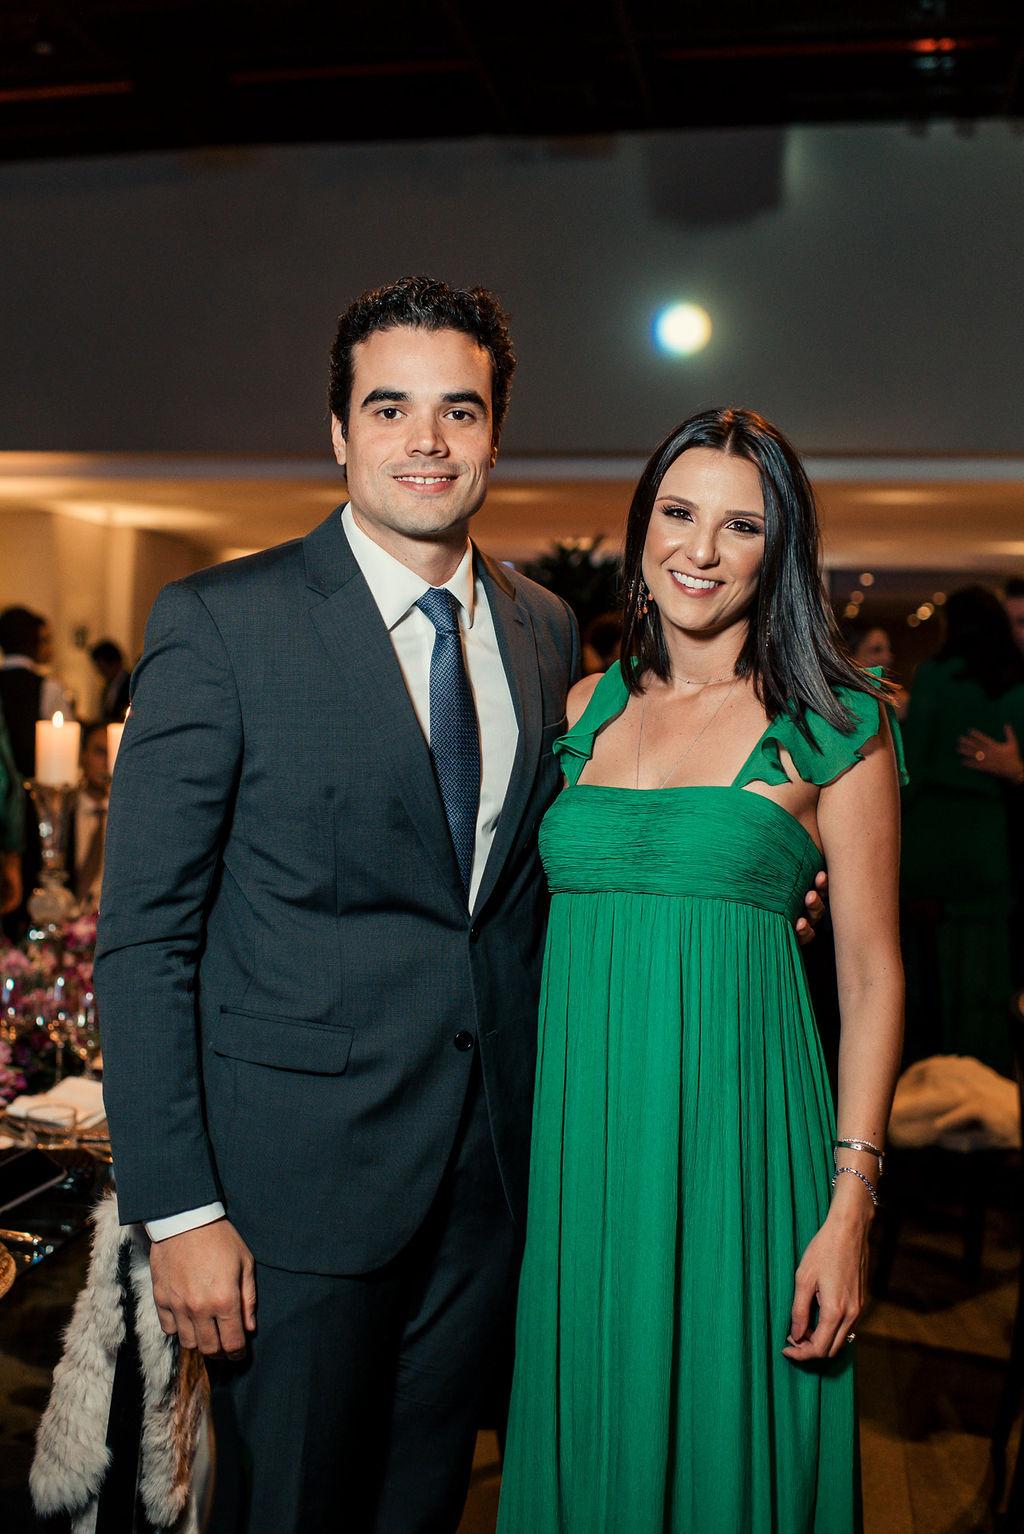 Família | Family Dr. Henrique Moraes Salvador Silva Credito: Lecanovo BrazilFoundation II Gala Minas Gerais Belo Horizonte Filantropia 2019